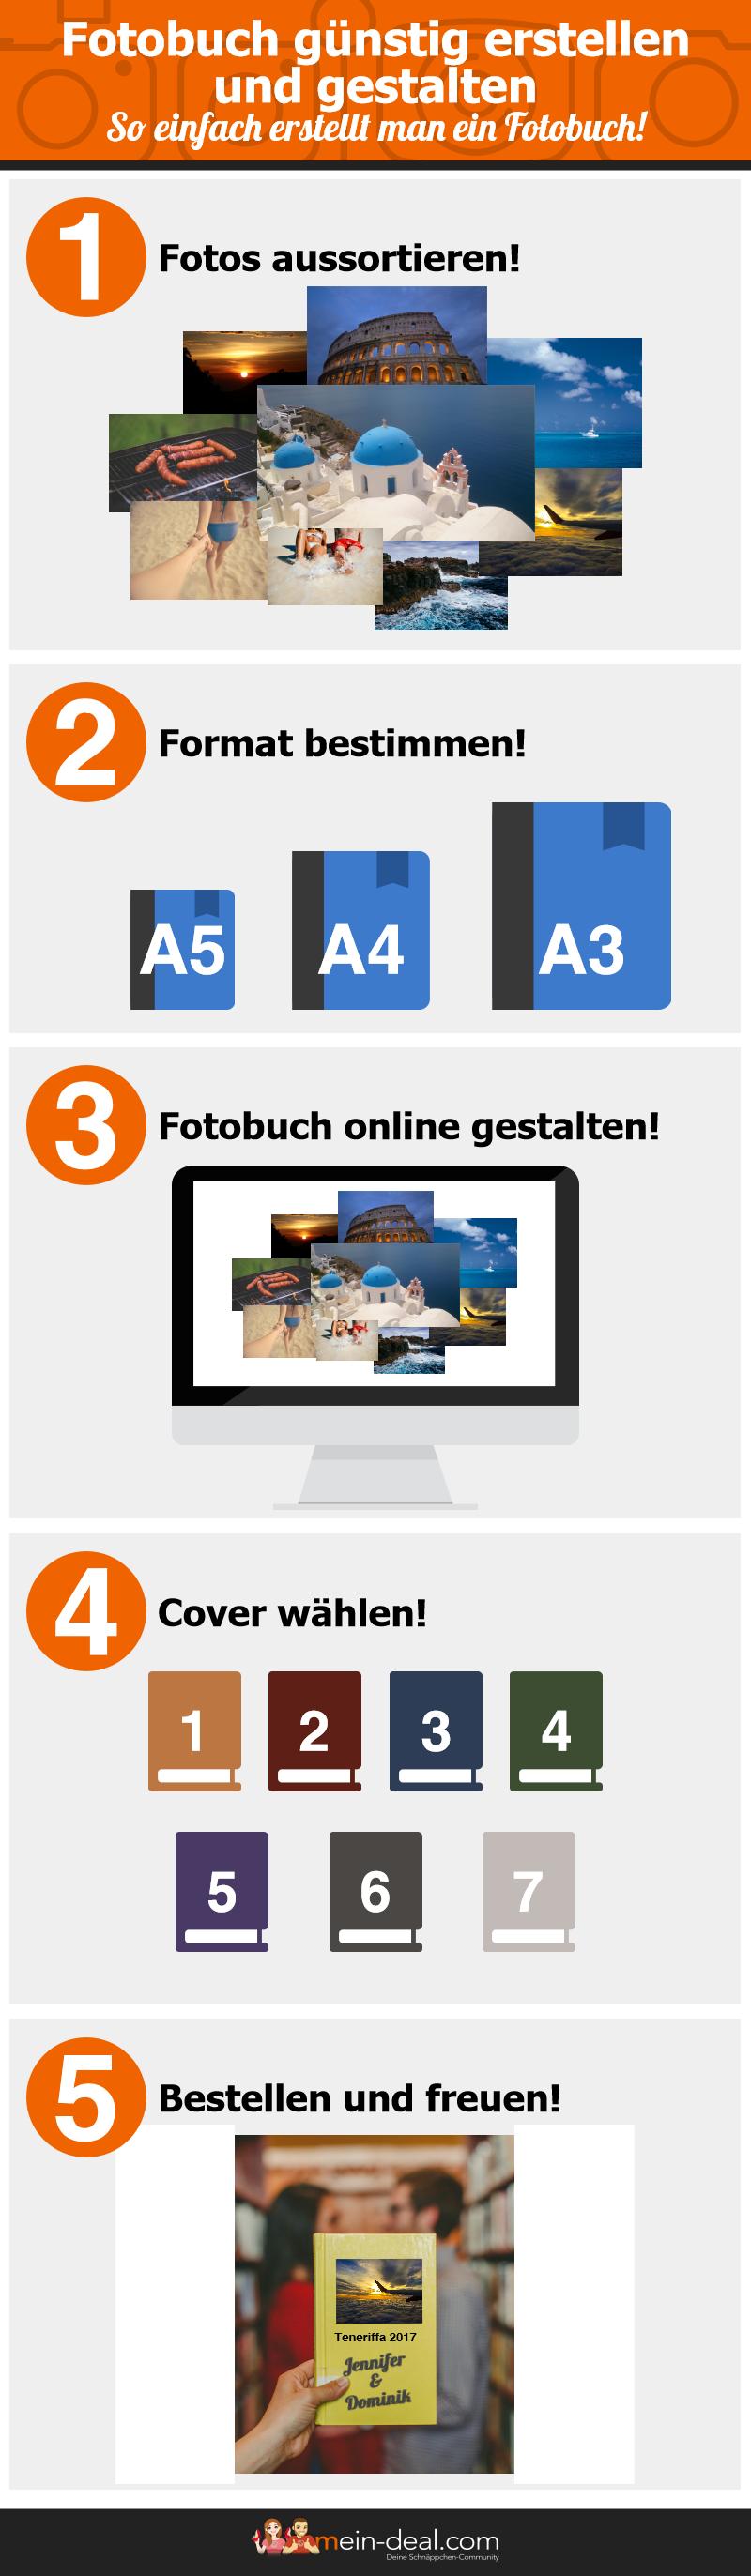 Großzügig Vorlage Fotobuch Galerie - Entry Level Resume Vorlagen ...